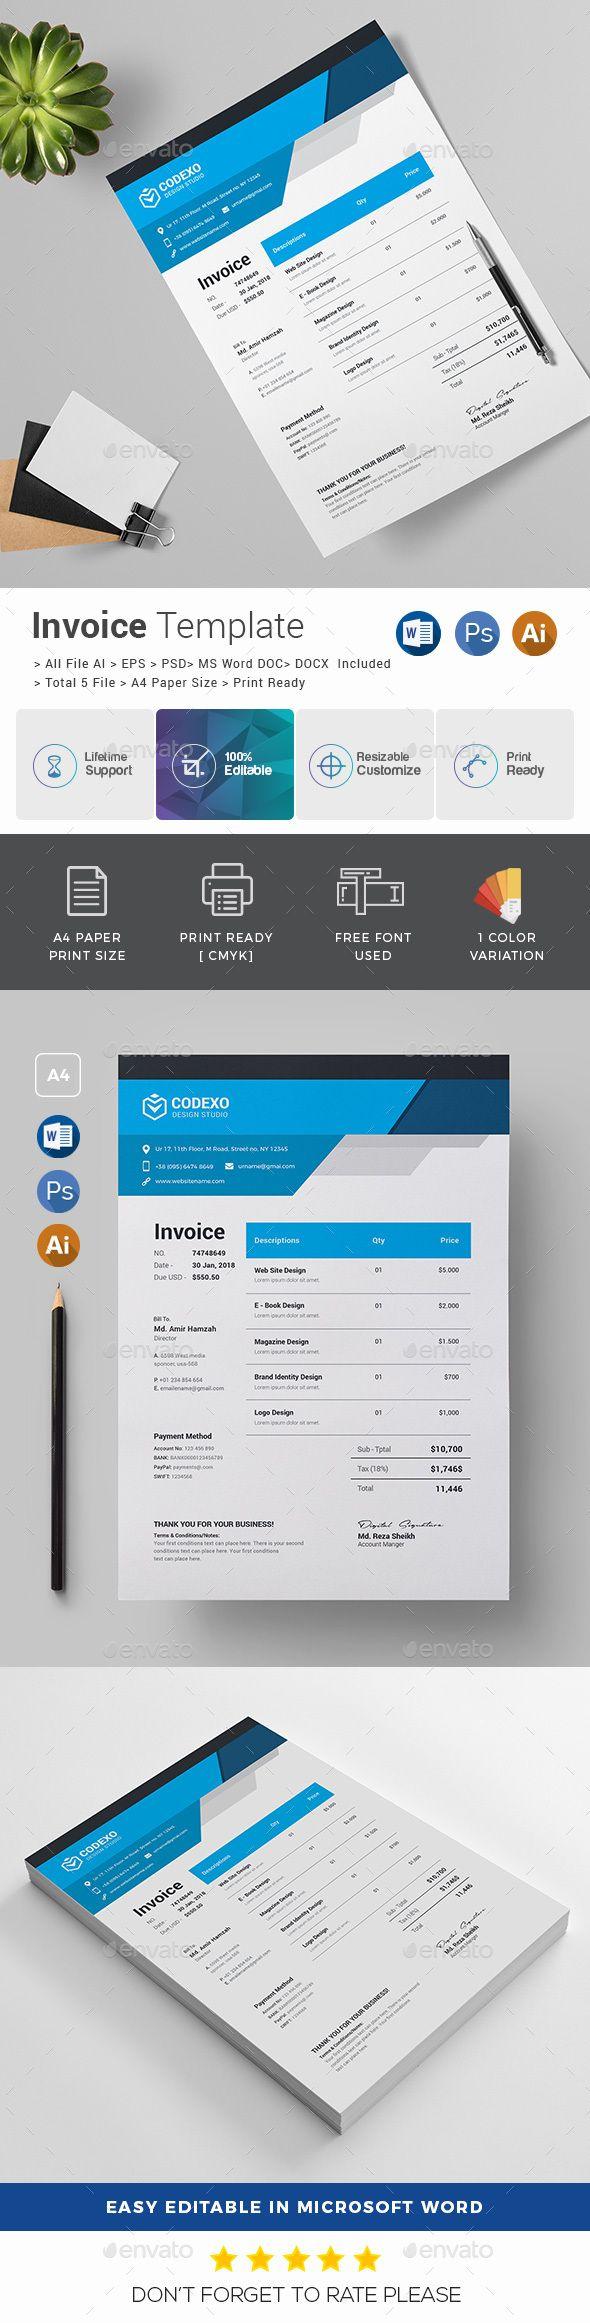 Corporate Invoice Template PSD, Vector EPS, AI Illustrator, MS Word